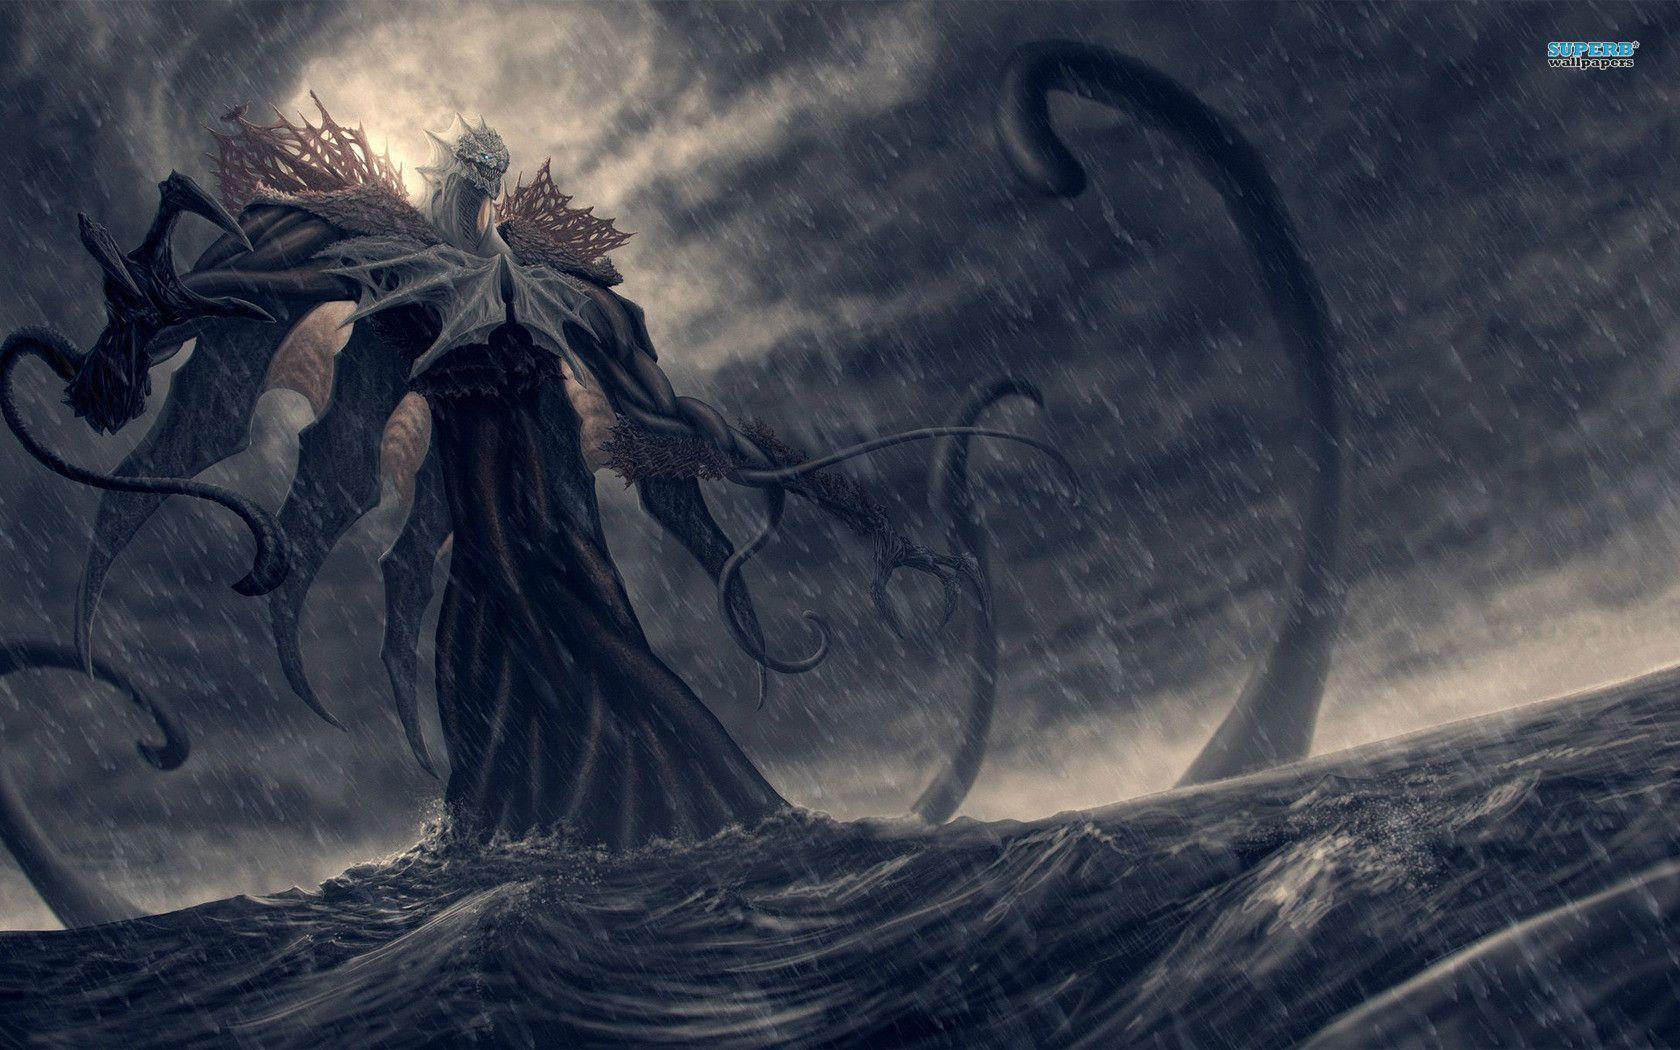 Giant Monster Wallpaper For Iphone Monster Pictures Ocean